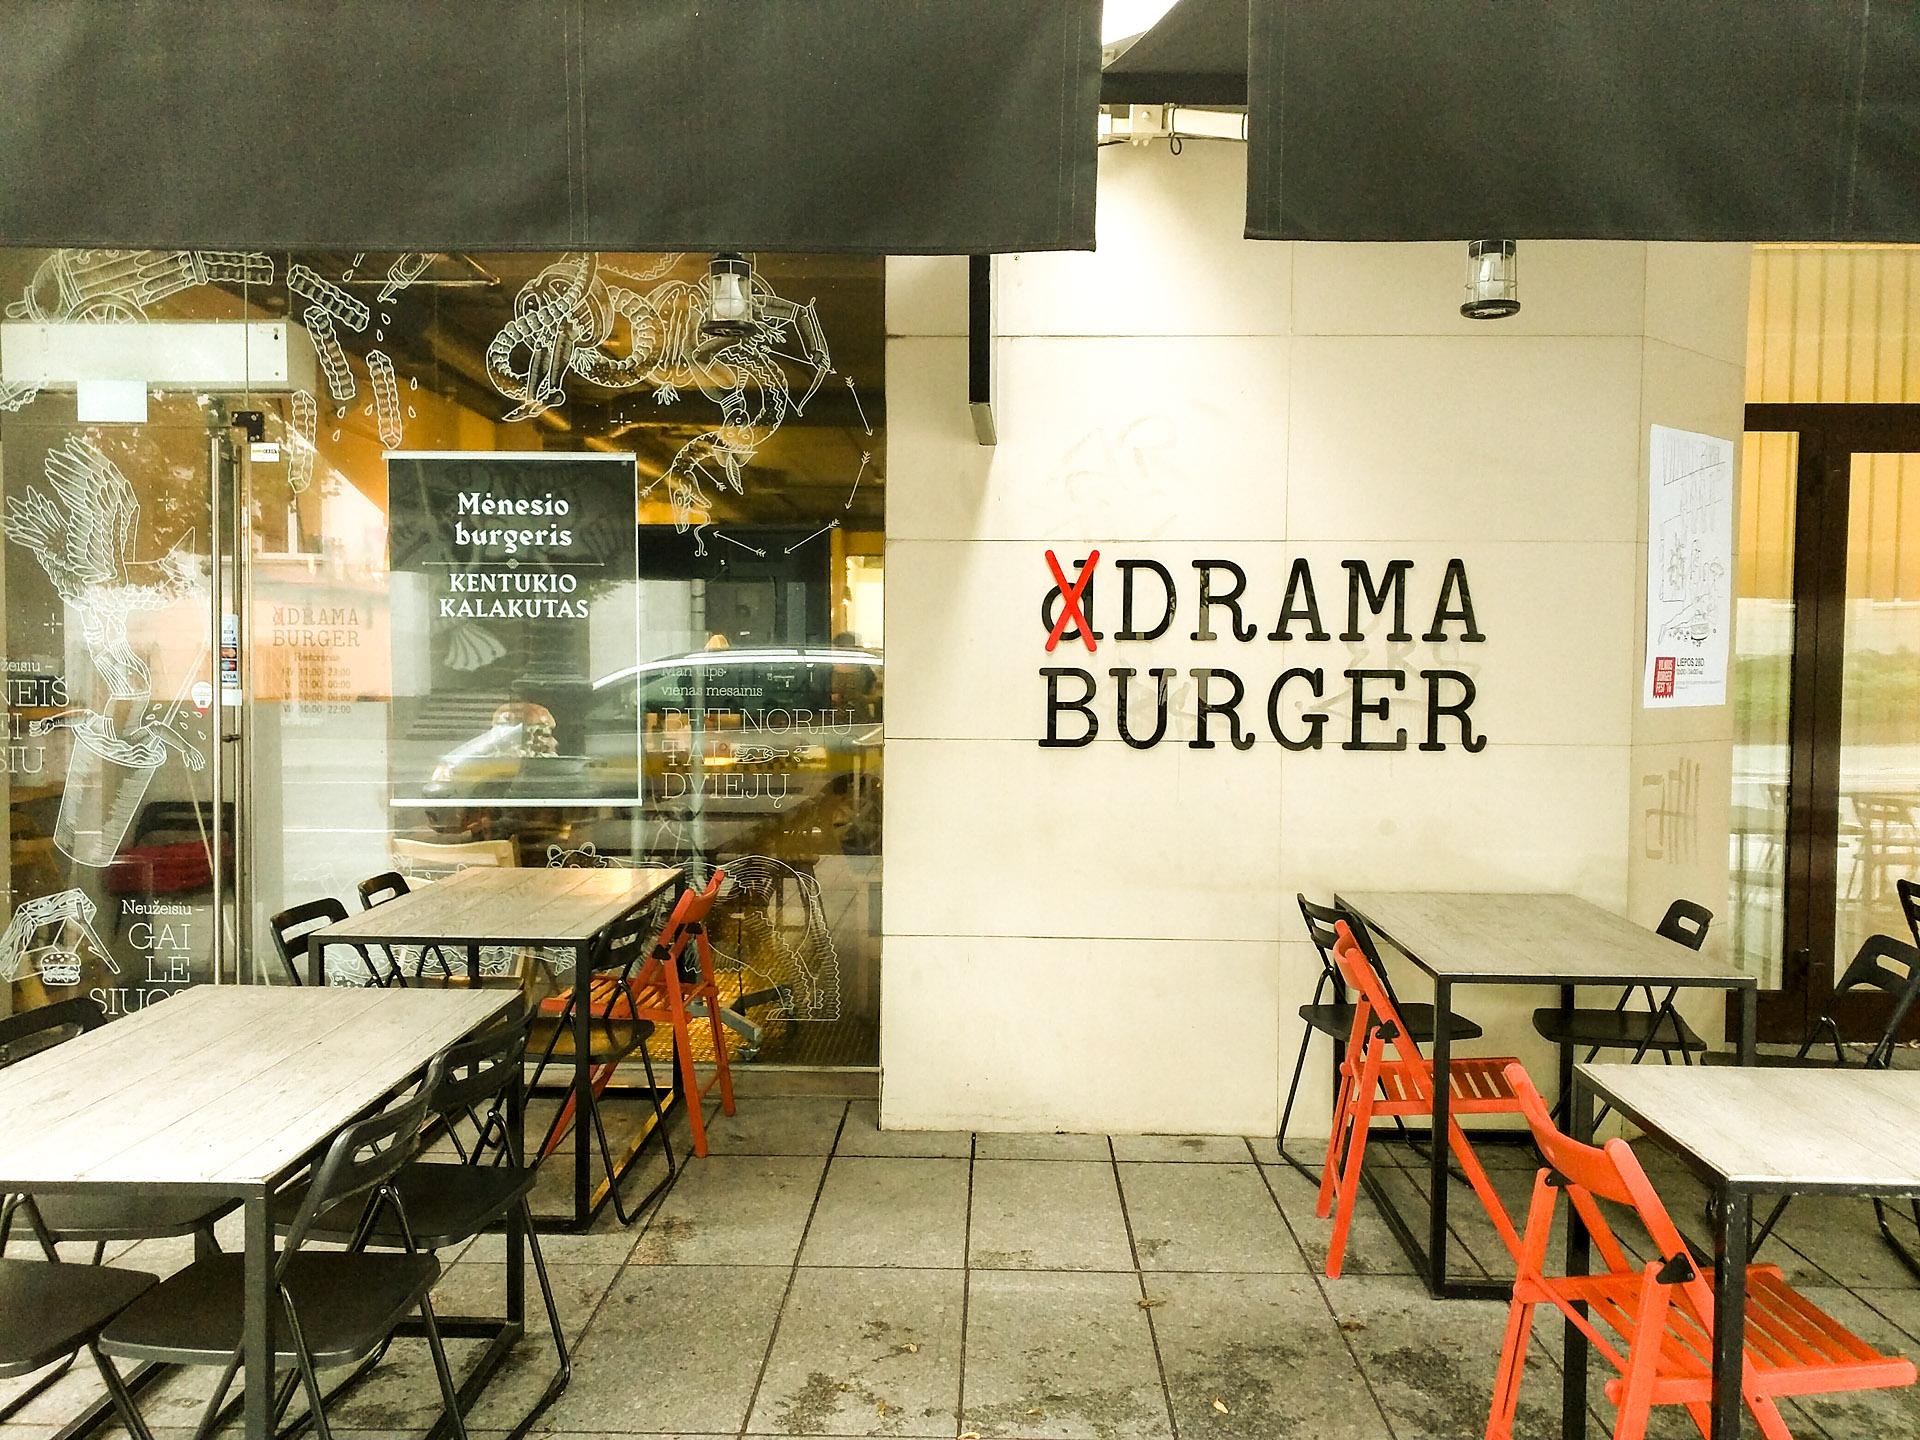 Drama Burger